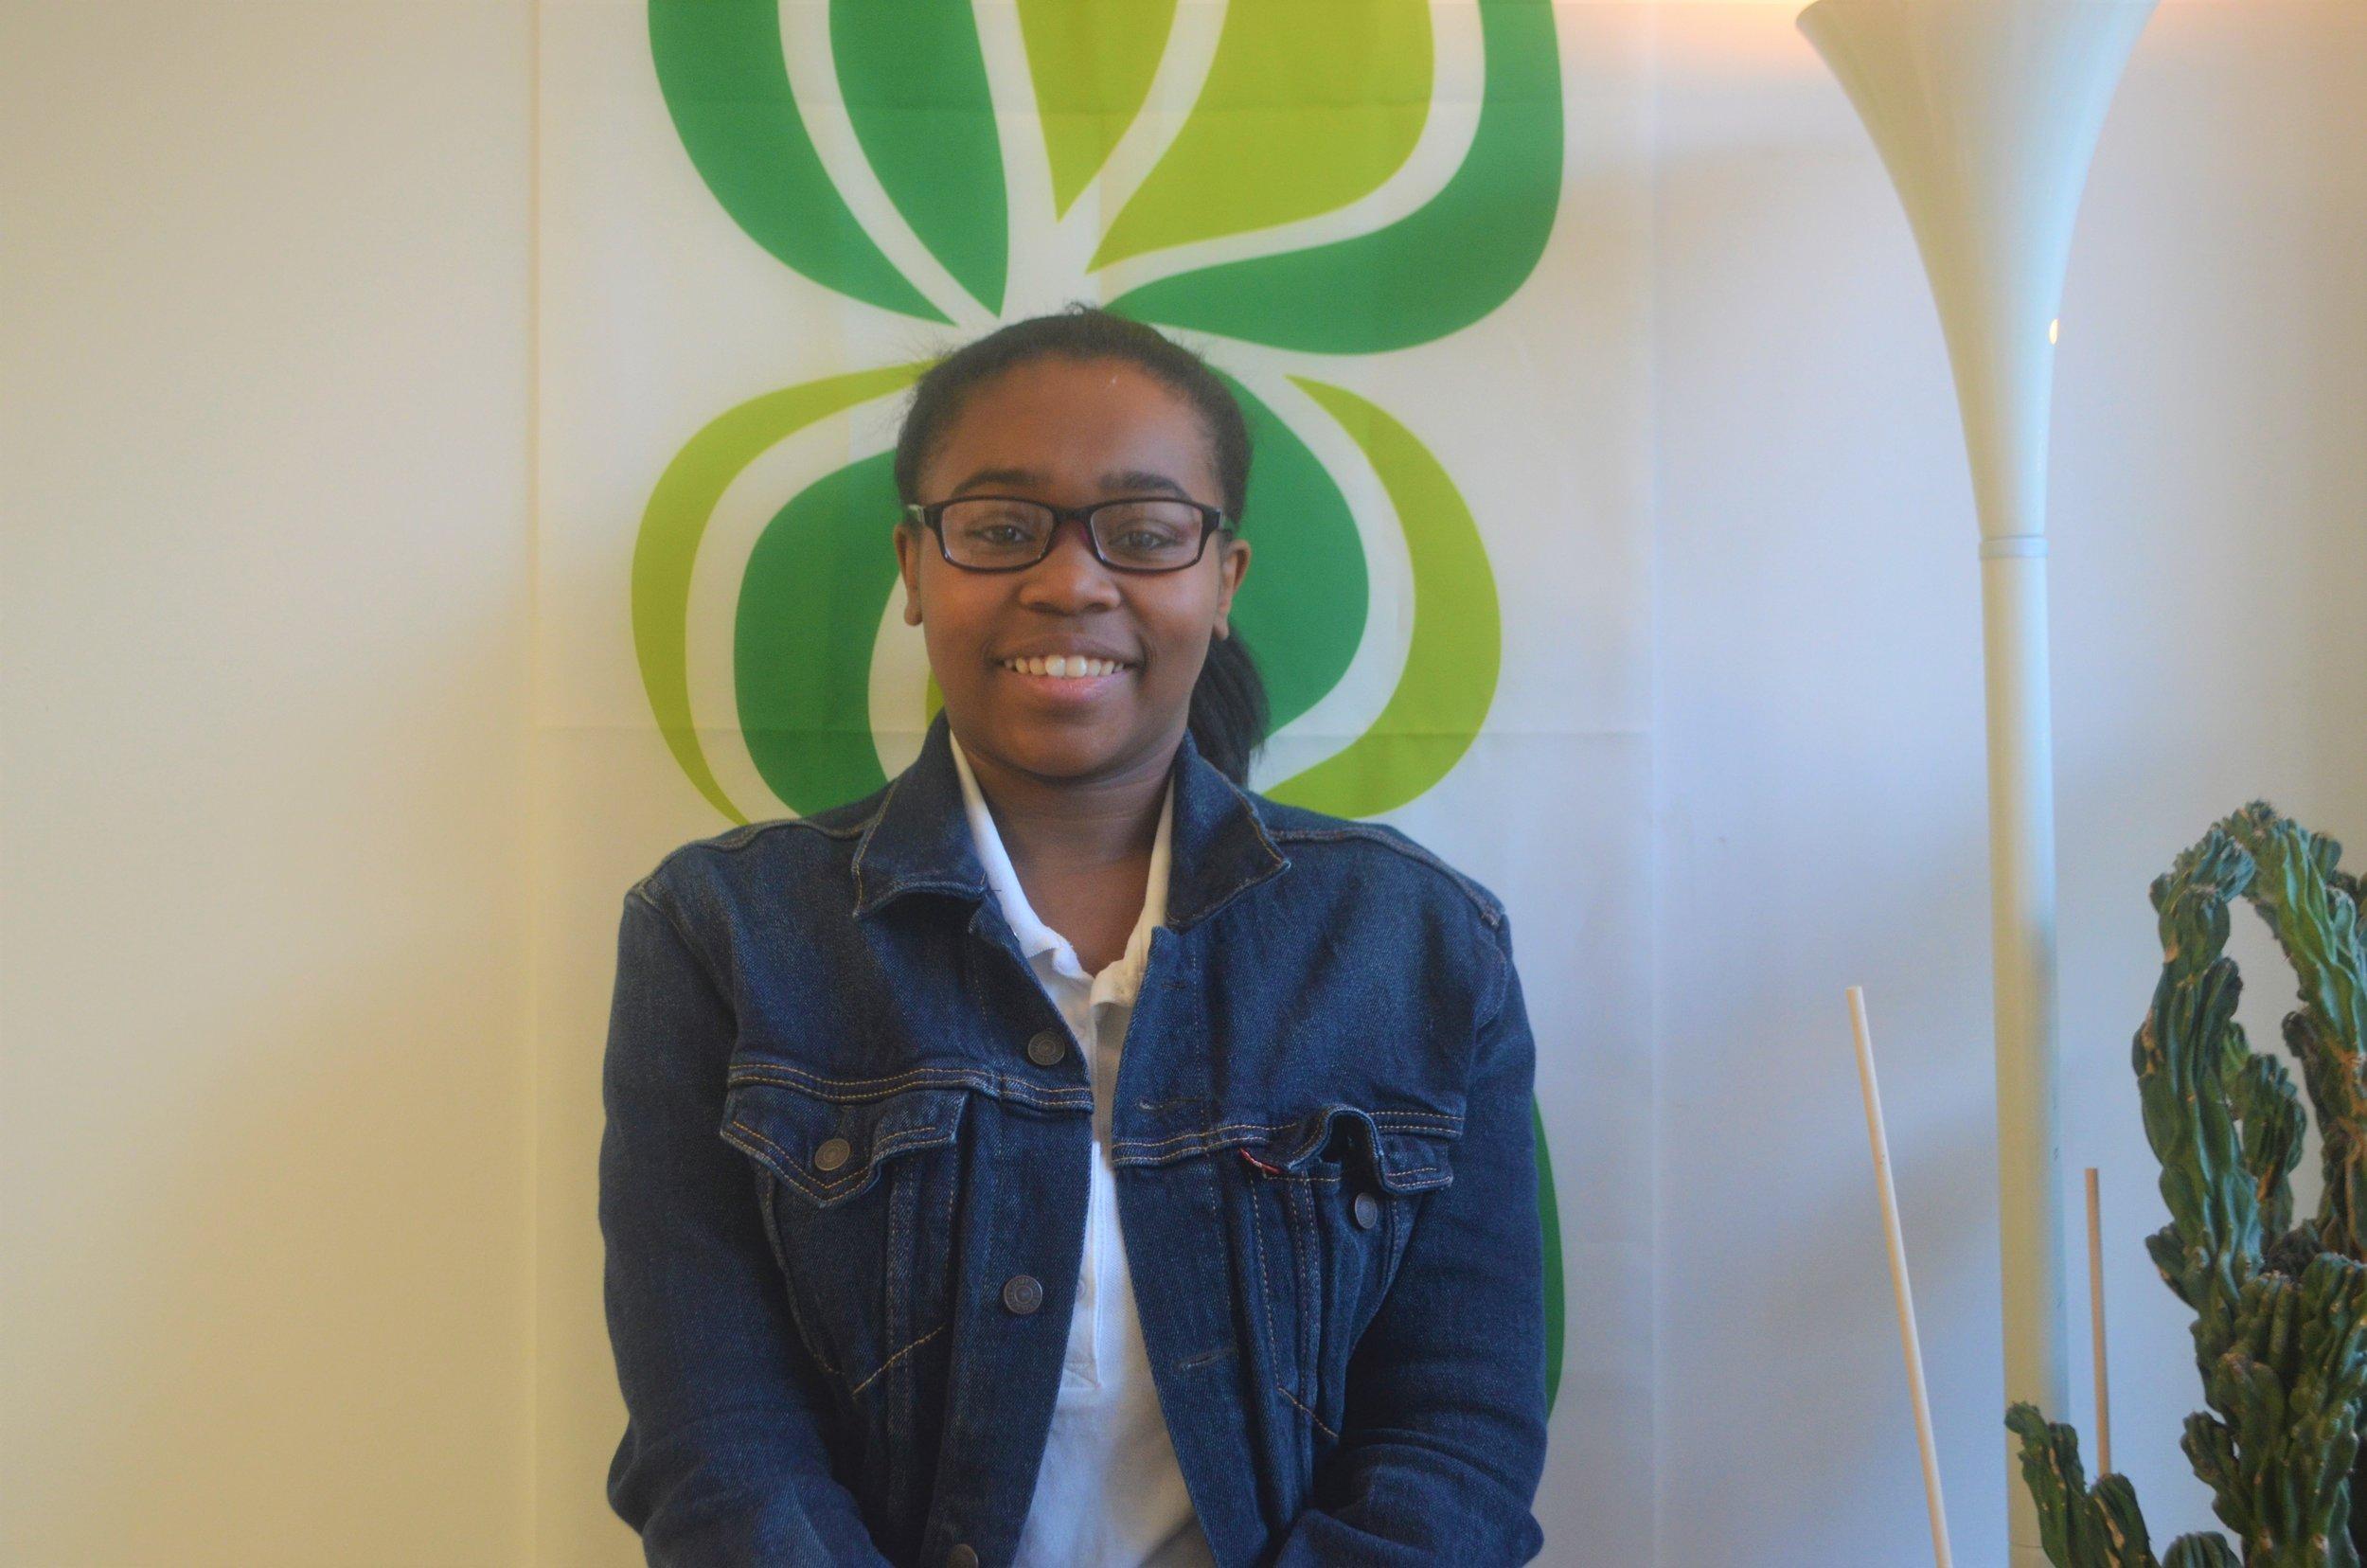 Mia Grace    My name is Mia Grace. I'm a Freshmen and I attend Fairchild Wheeler.